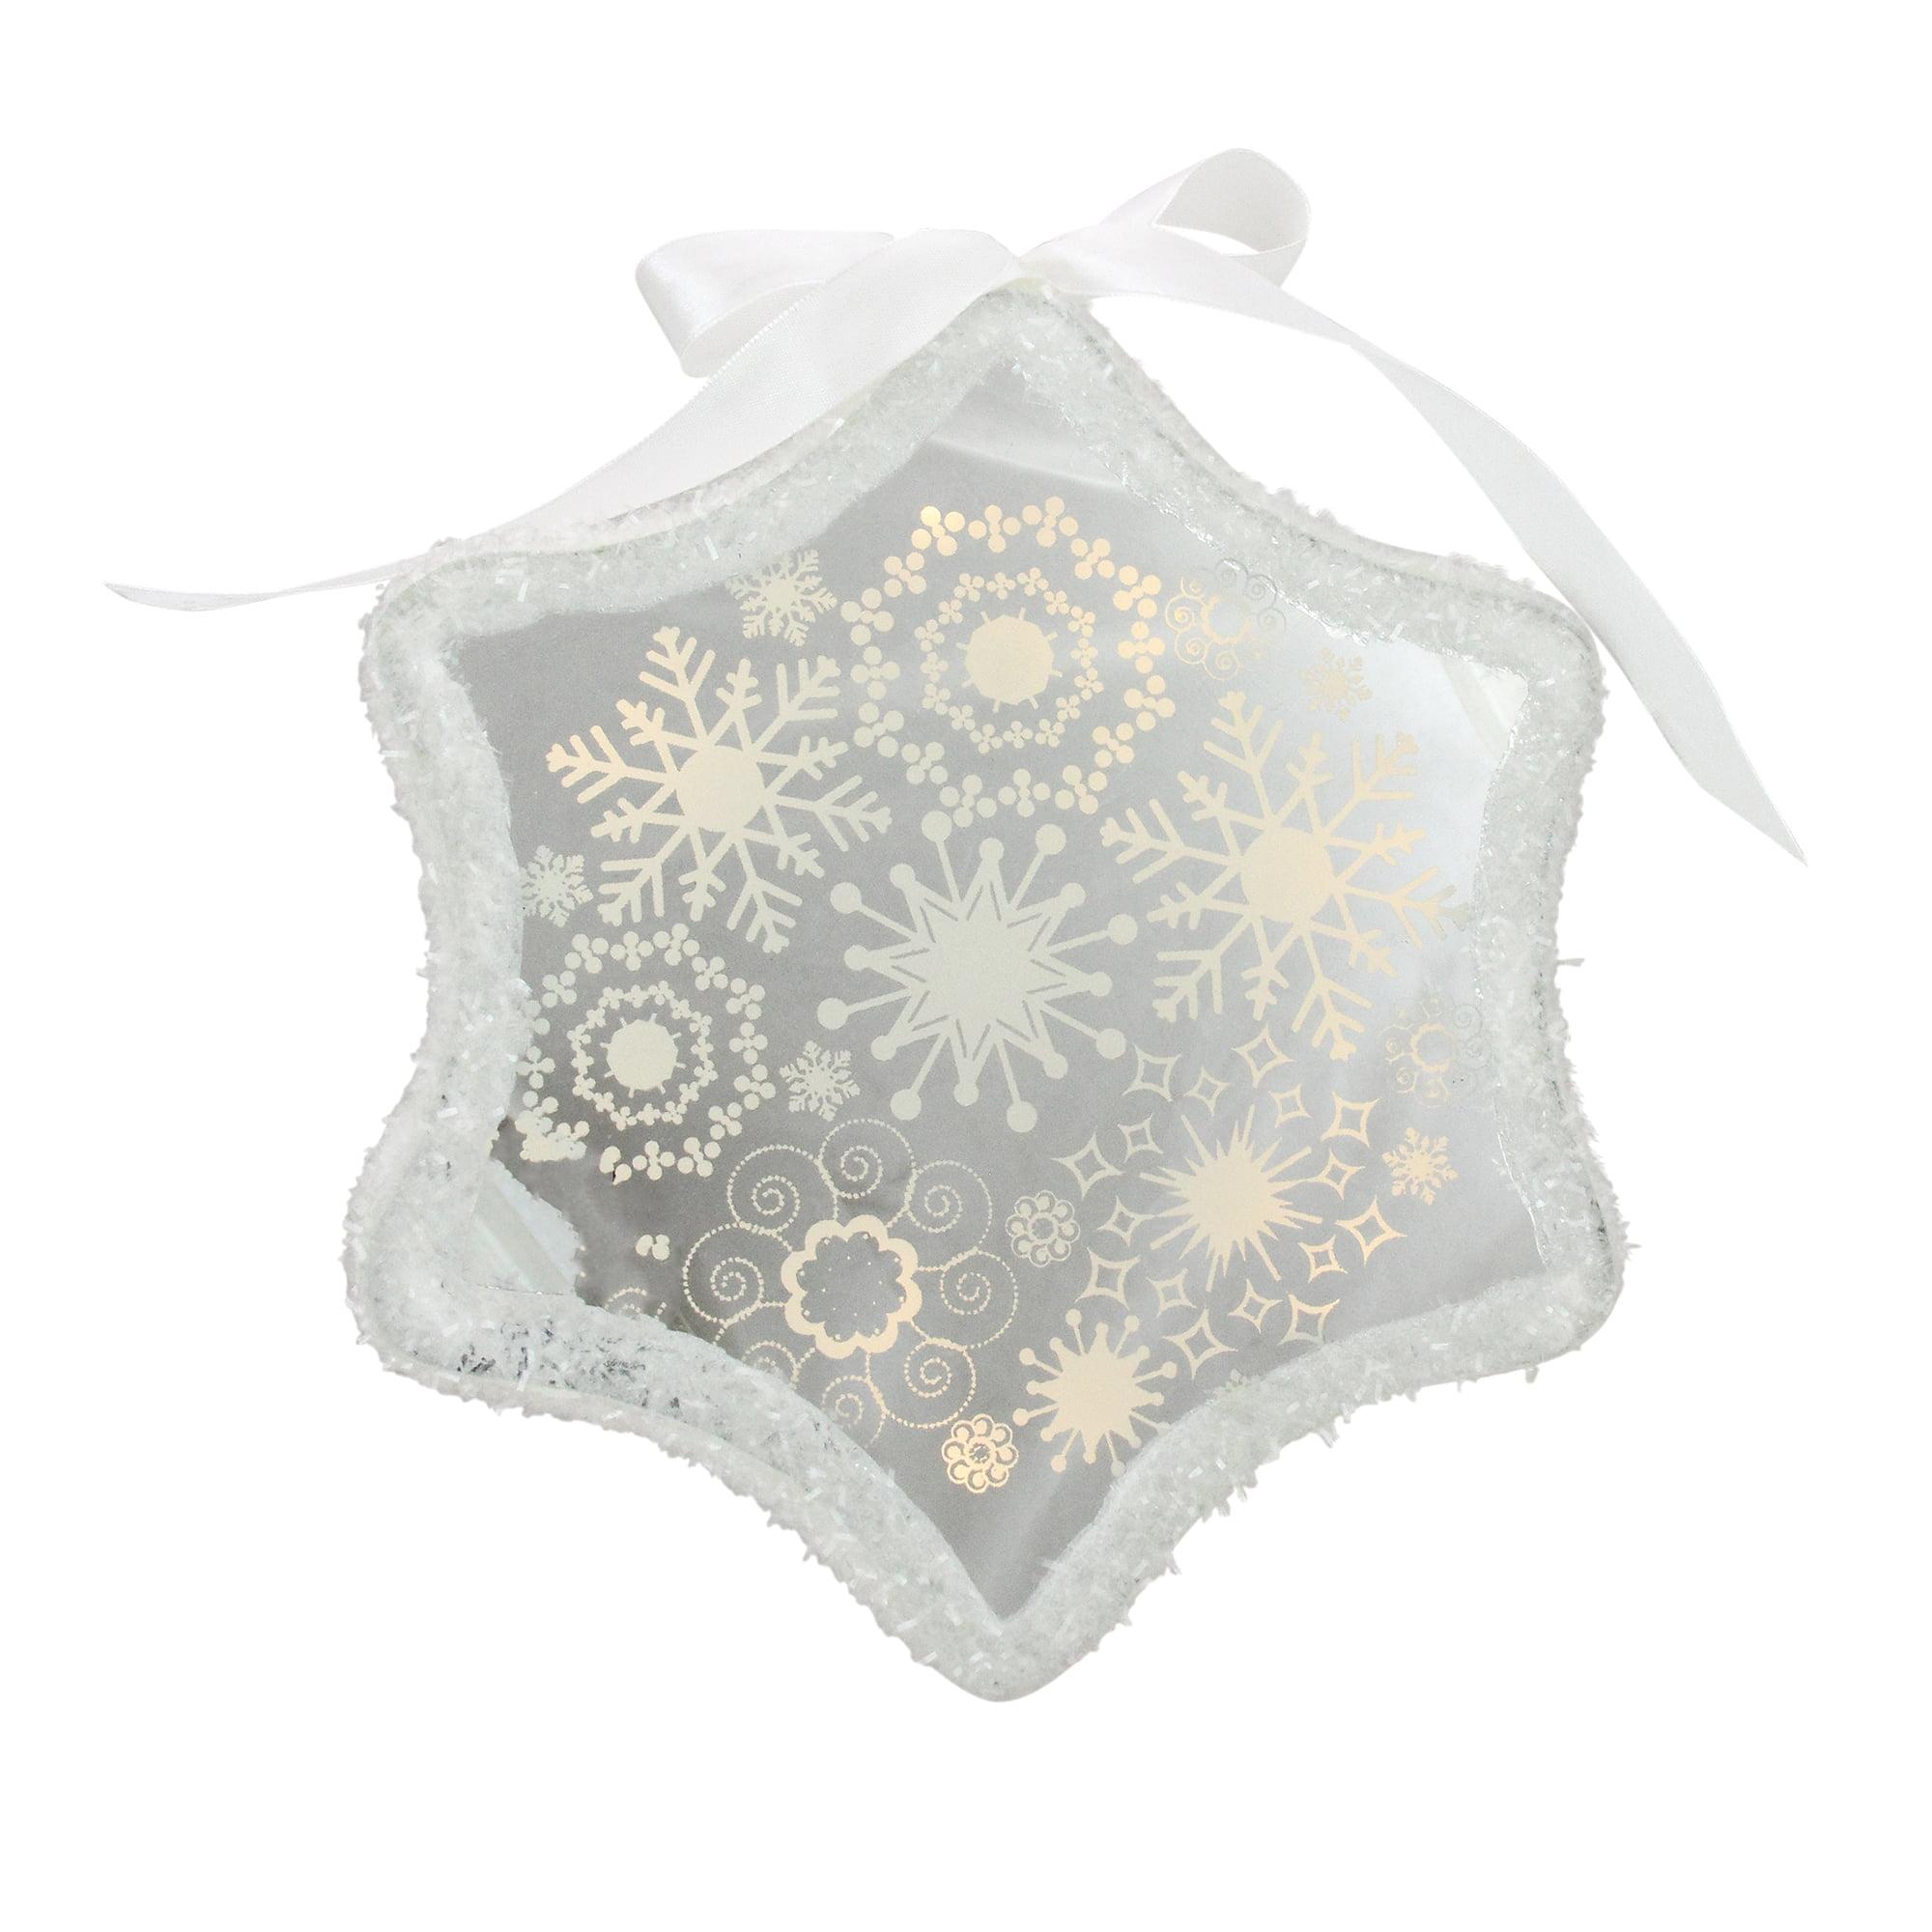 9 Pre Lit Led White Sparkle Snowflake Scene Christmas Snowflake Ornament Walmart Canada